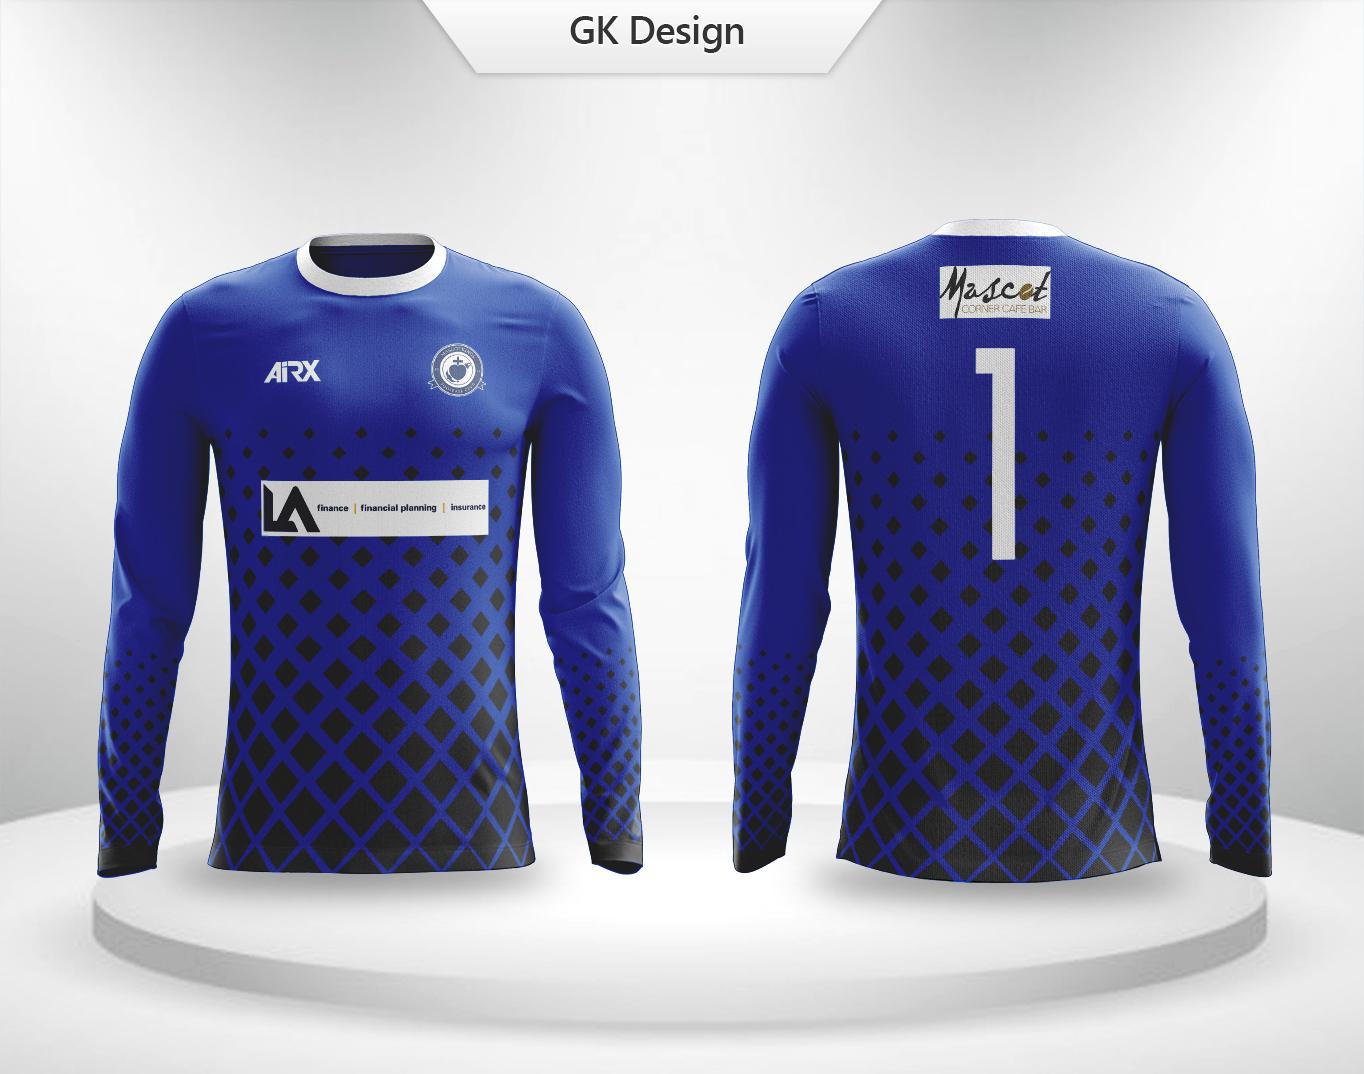 Mascot GK Jersey Design.JPG